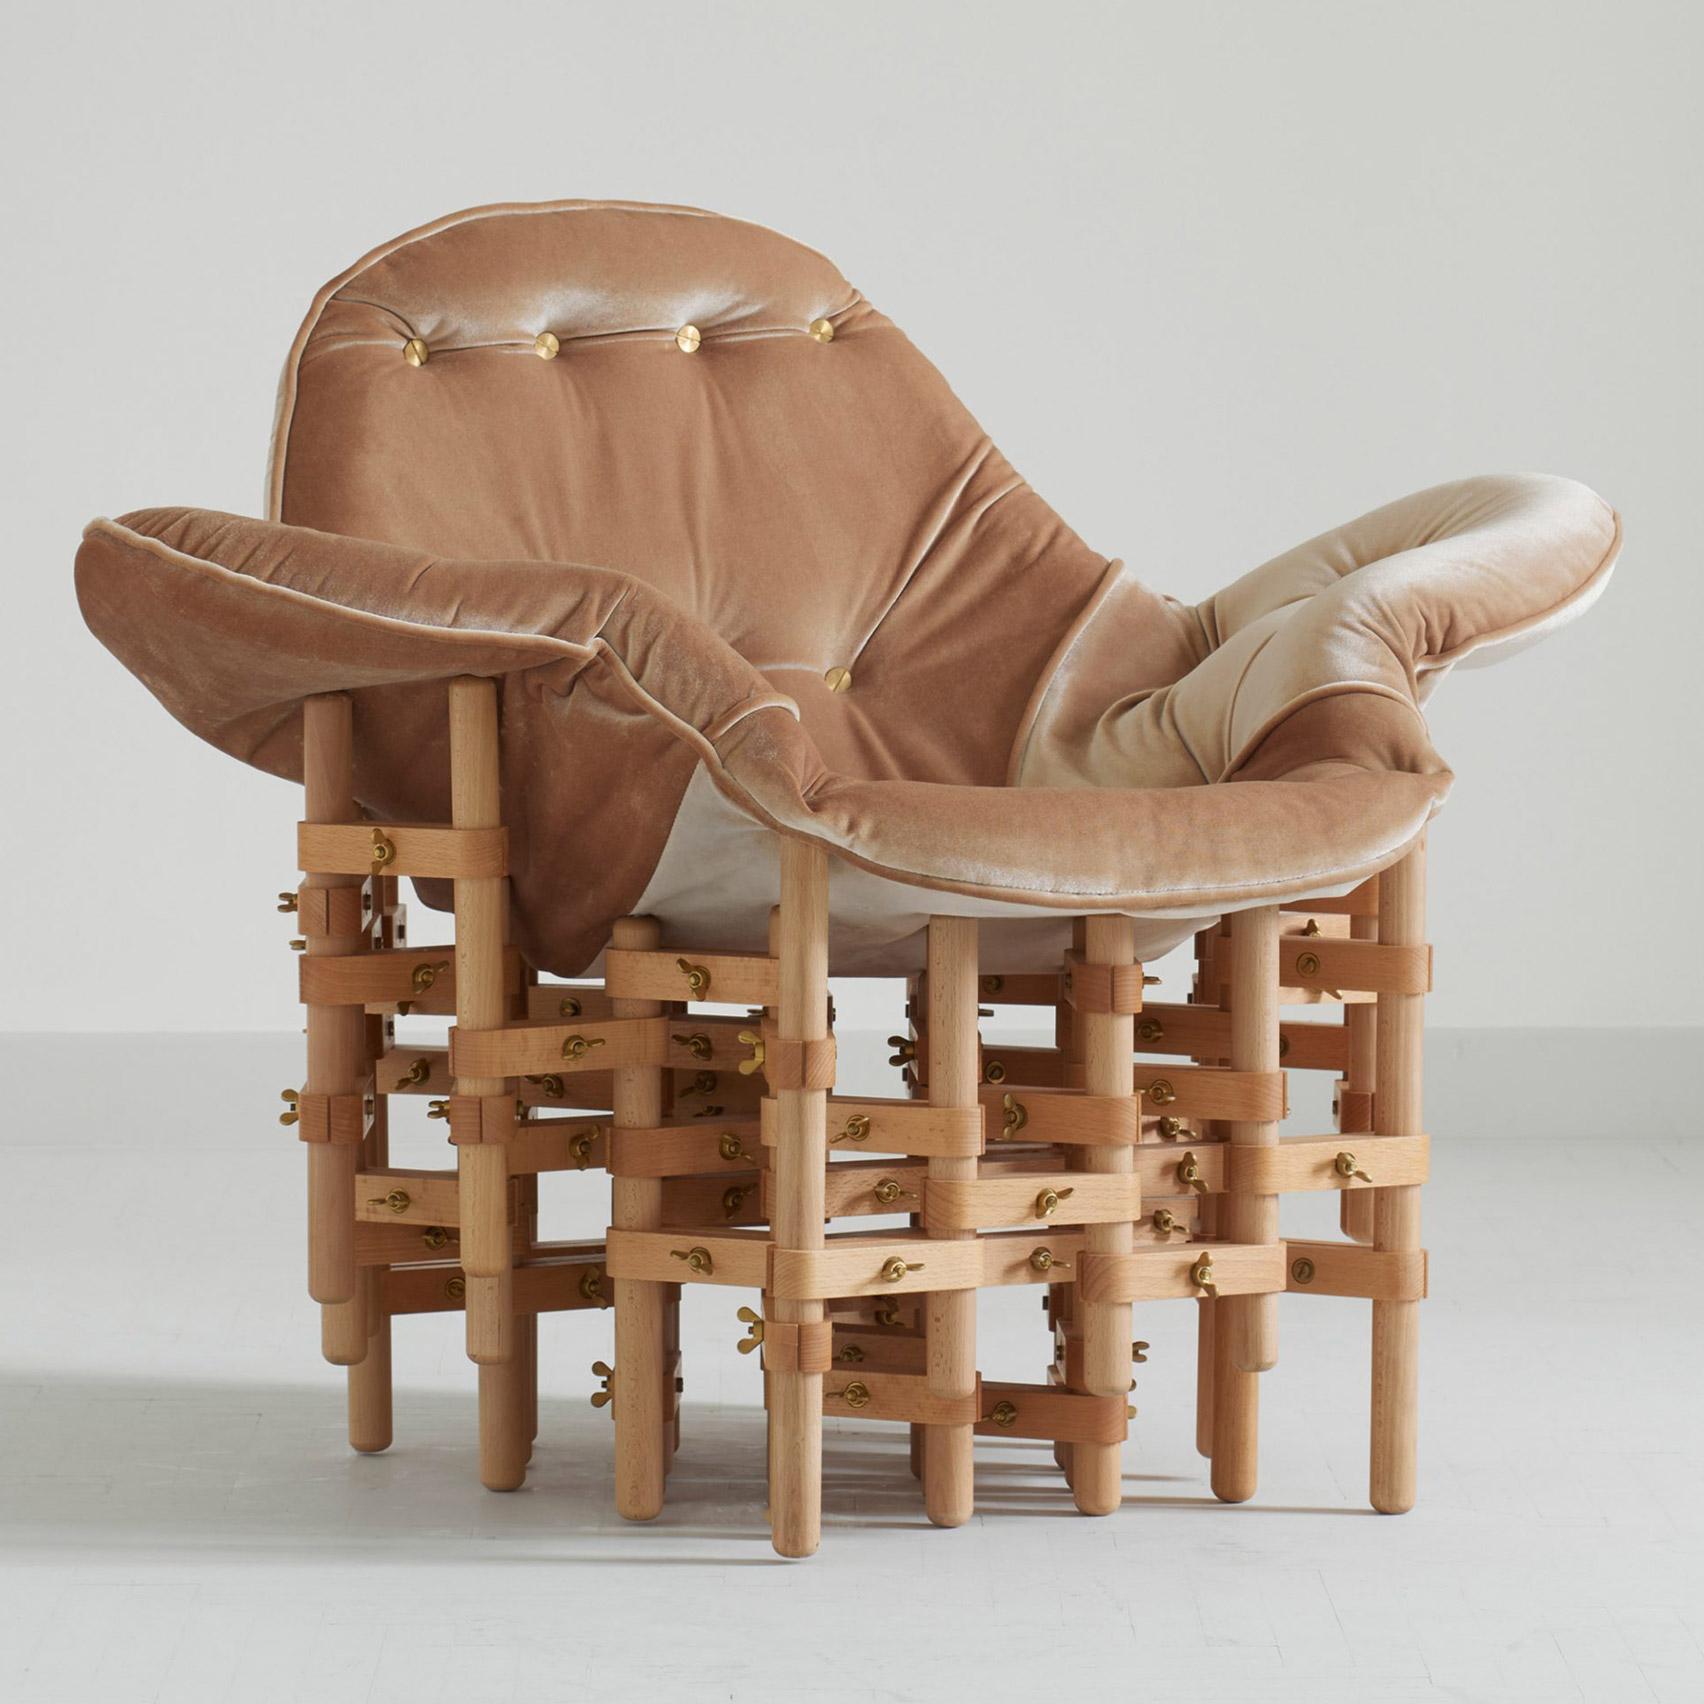 envisioned-comfort-furniture-collection-design-sq-1